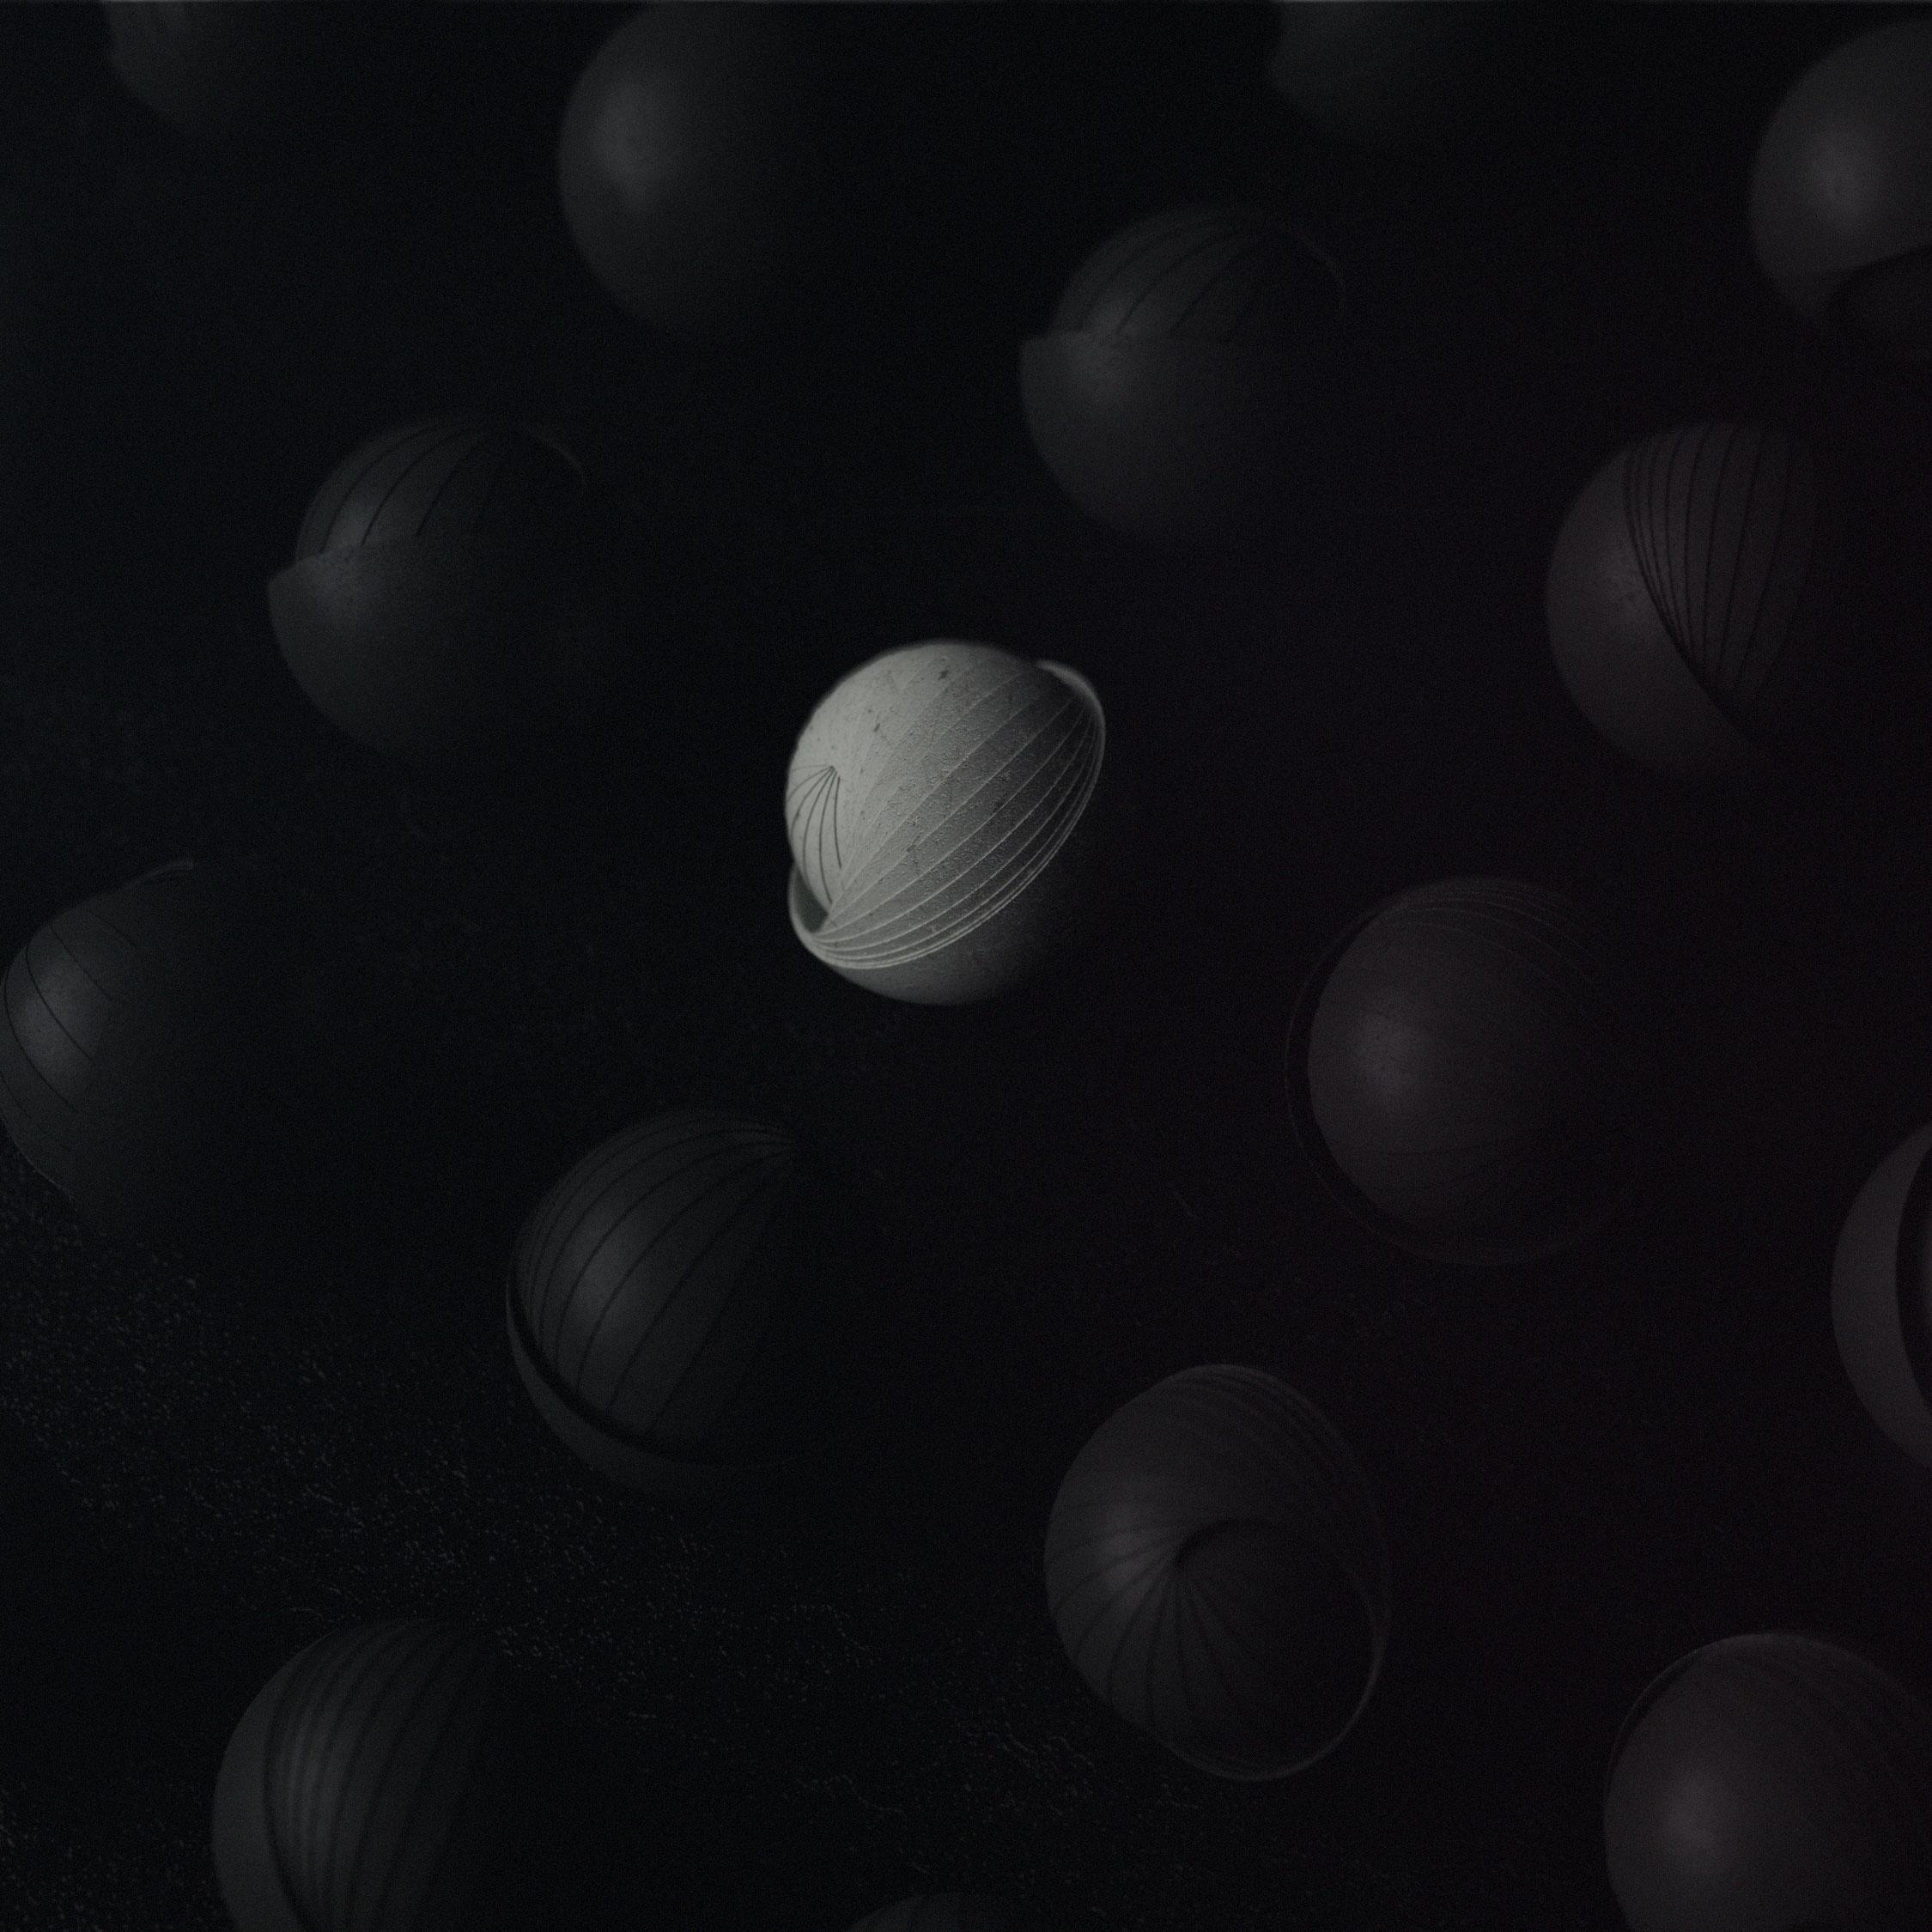 Cinema 4D - Adobe After Effect